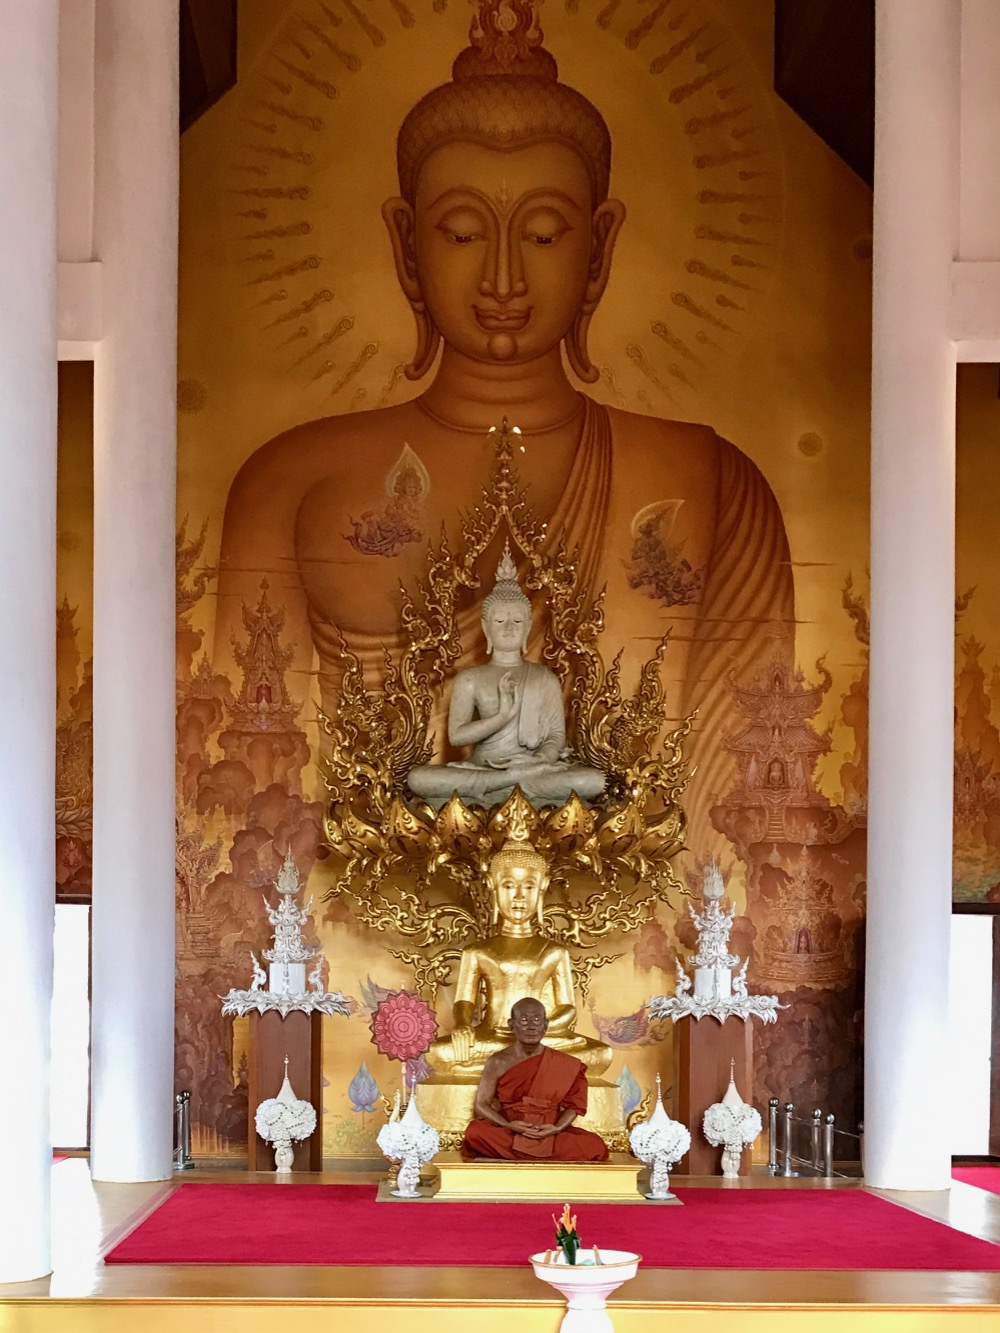 Inside  Wat Rong Khun - The White Temple in Chiang Rai